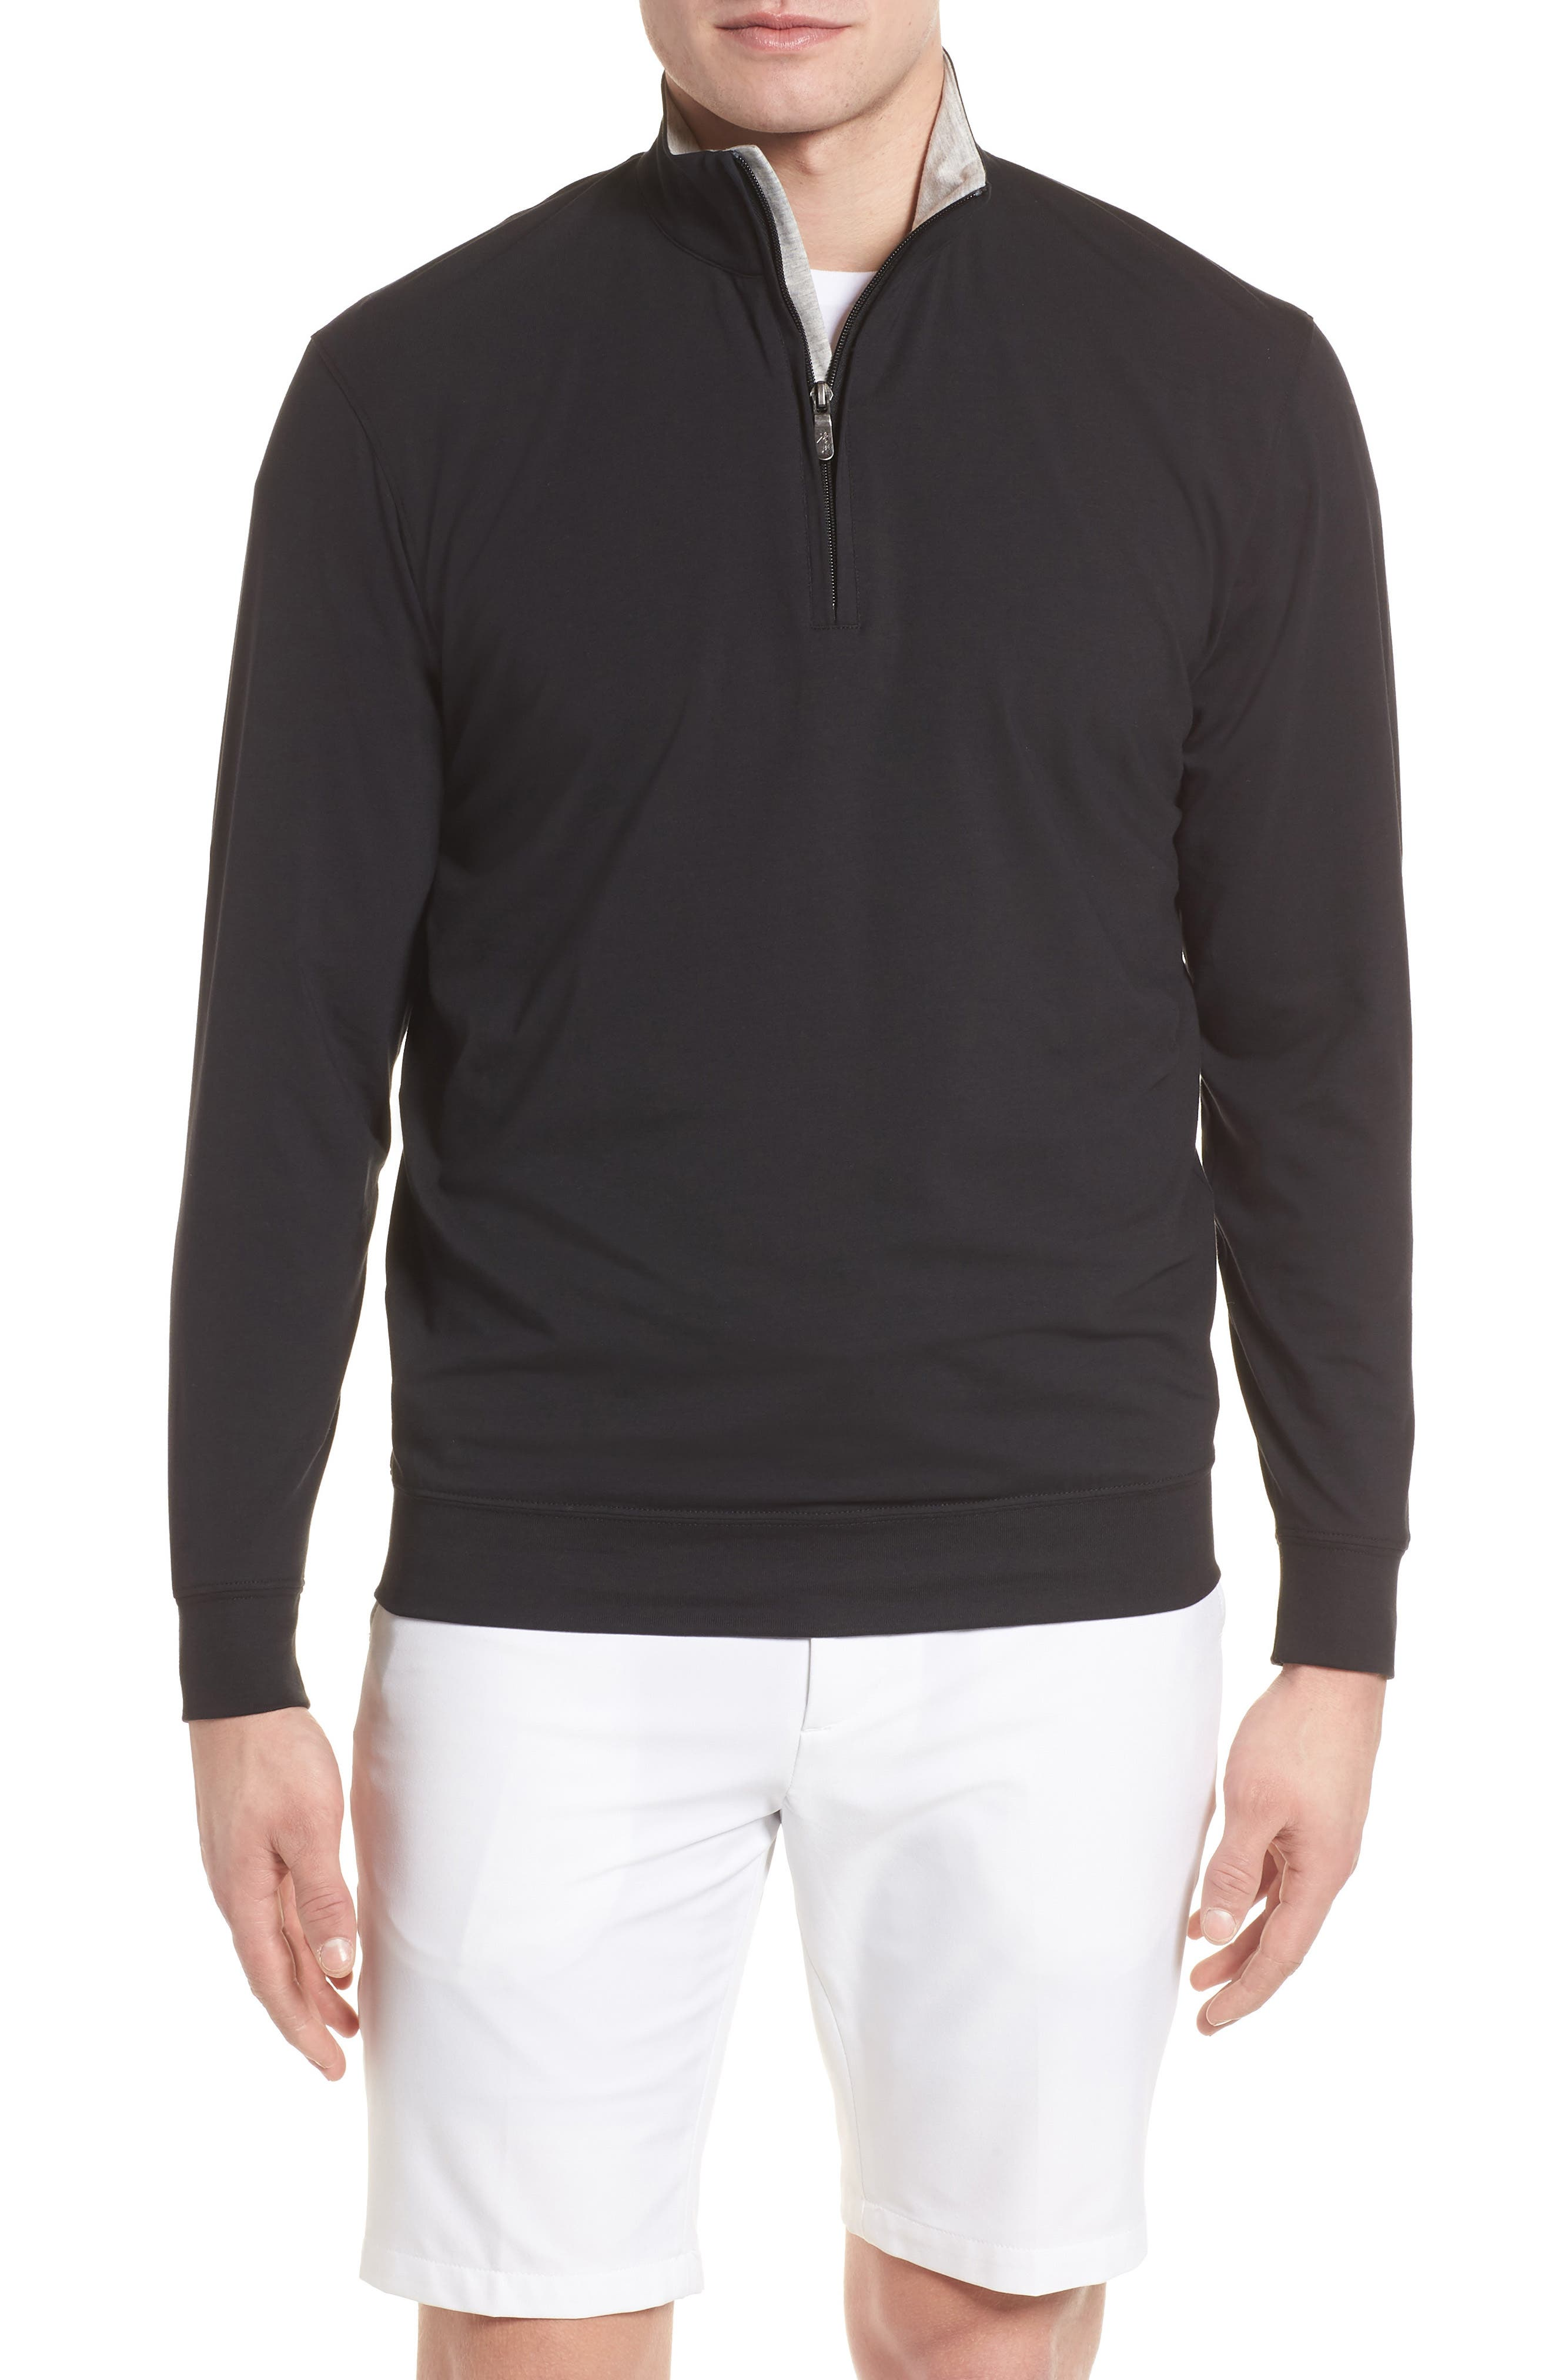 PTO Liquid Stretch Quarter Zip Pullover,                             Main thumbnail 1, color,                             BLACK